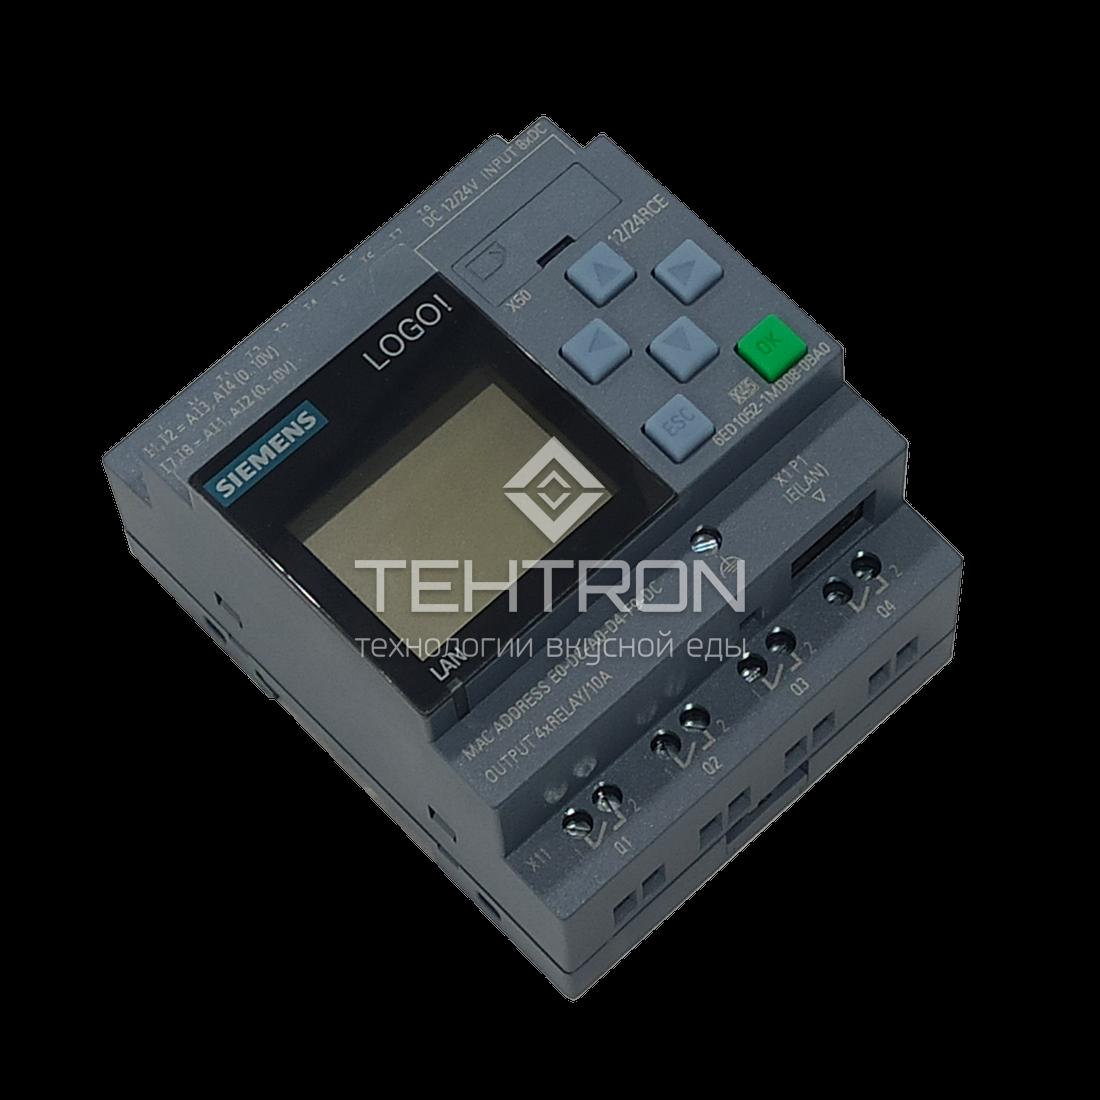 Запасные части для термокамер Техтрон. Микроконтроллер Siemens Logo.